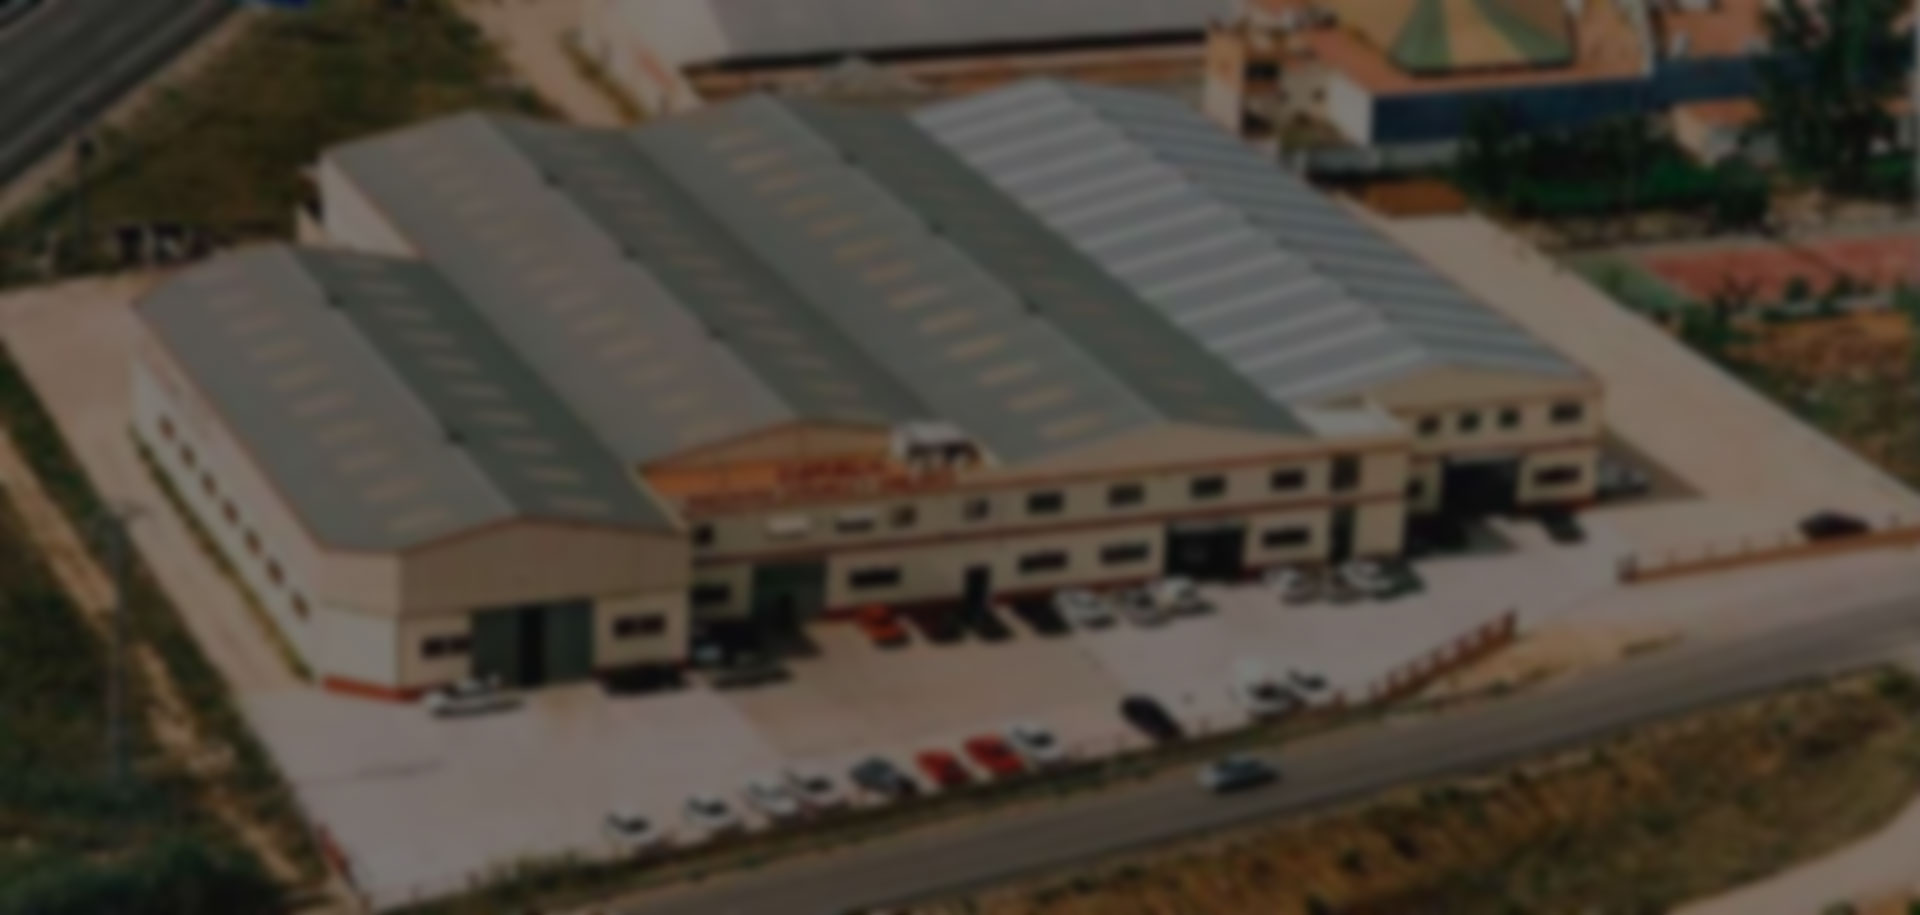 Ifamac fabricaci n de maquinaria cer mica e industria en for Ceramica fabricacion